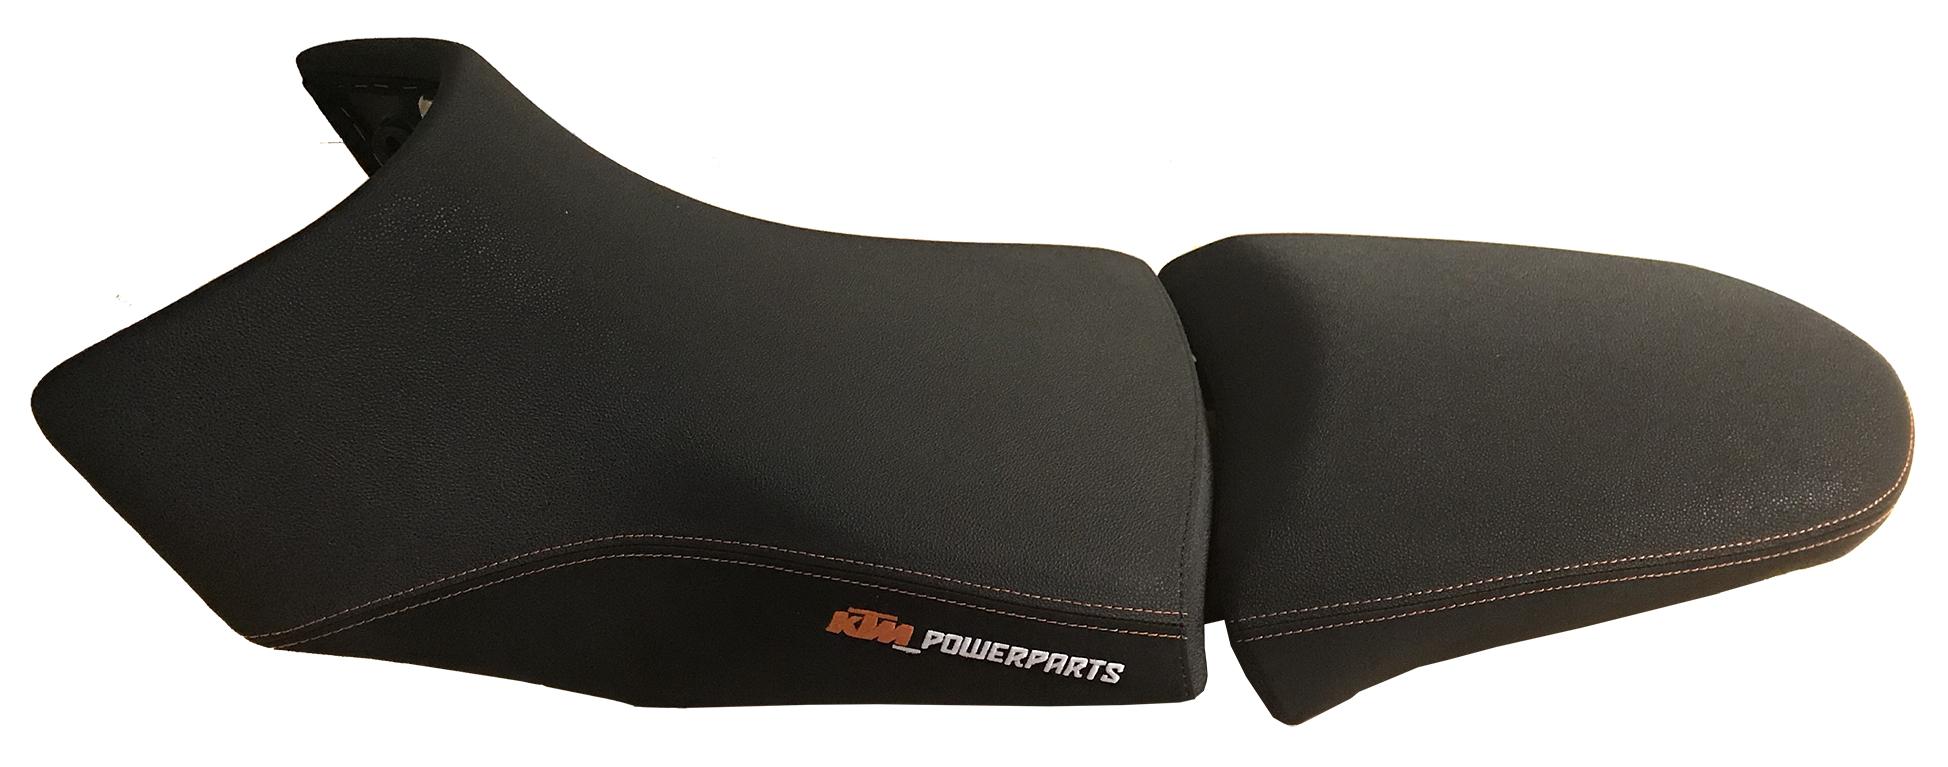 key motorcycle accessories: KTM ergo seat